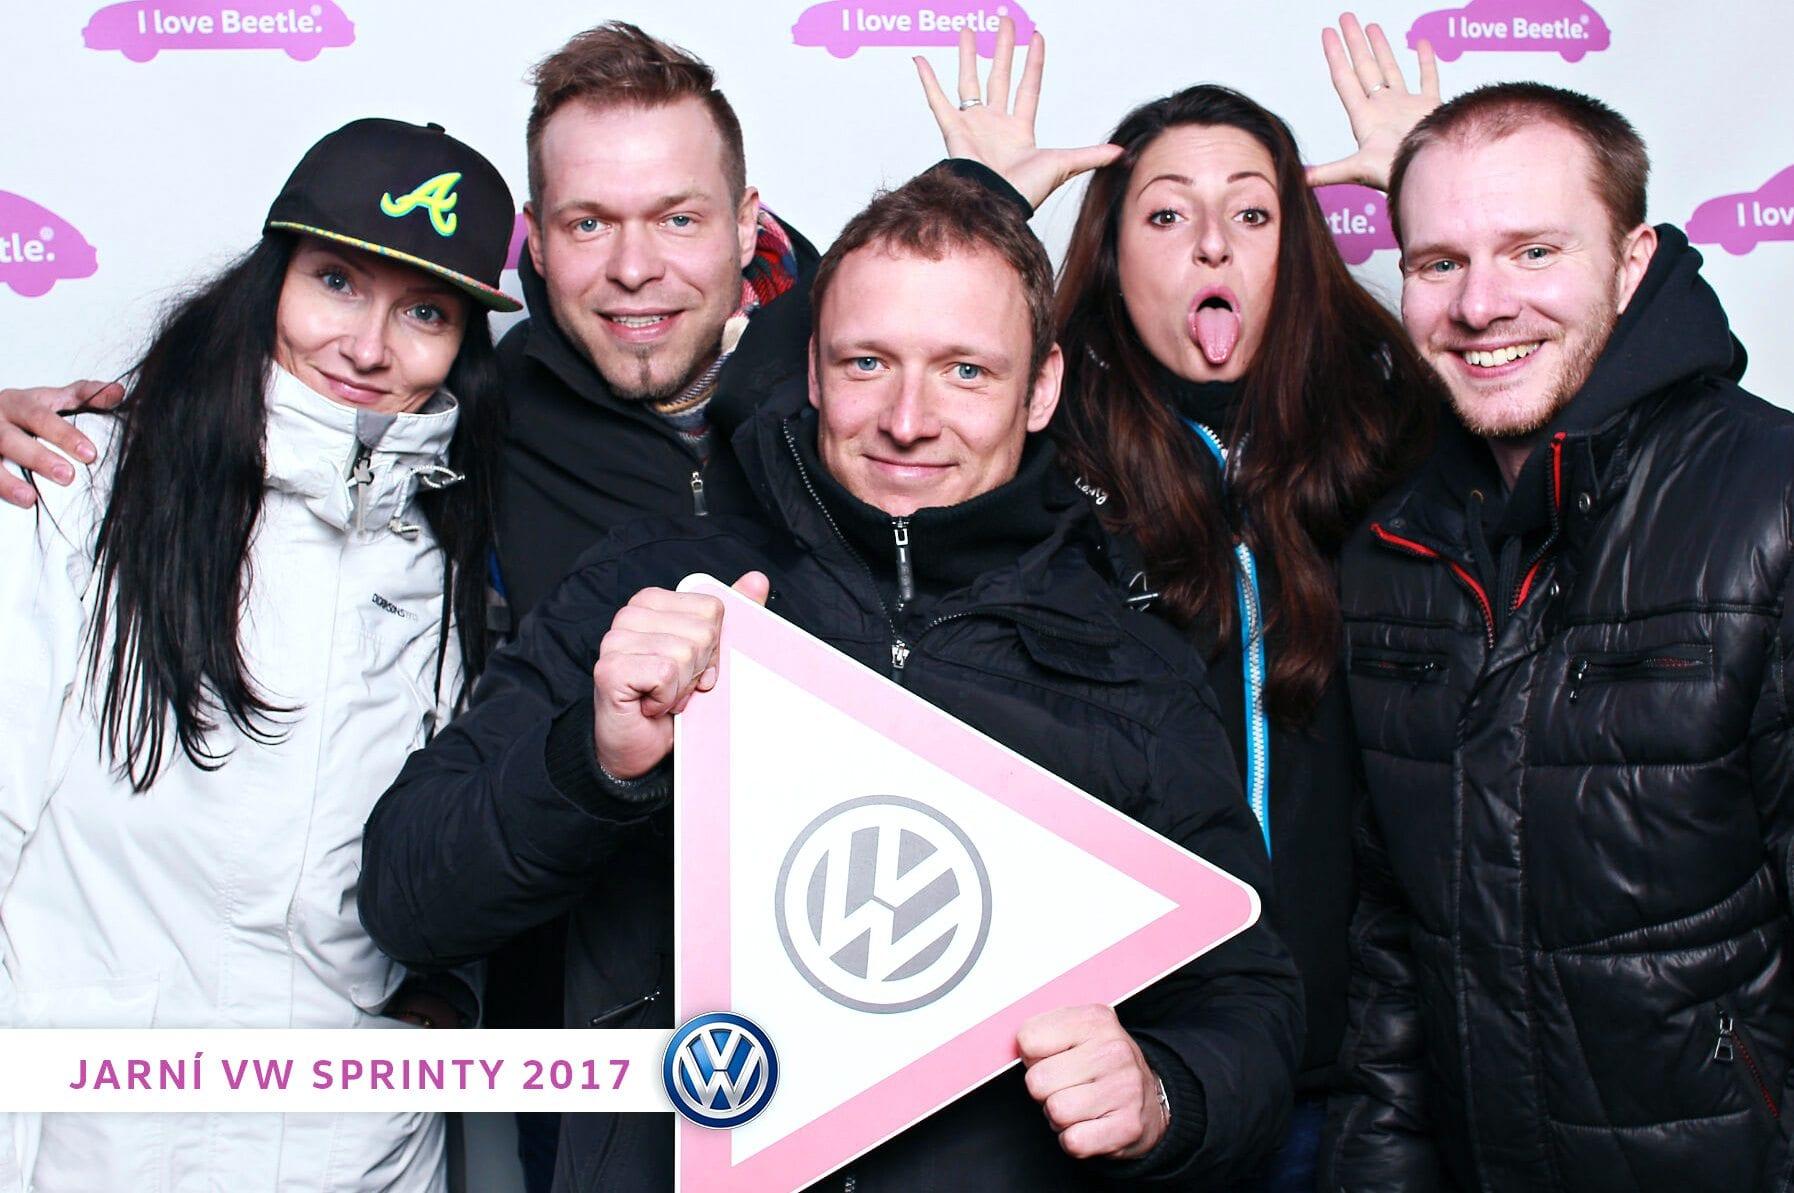 fotokoutek-jarni-vw-sprinty-22-4-2017-237369